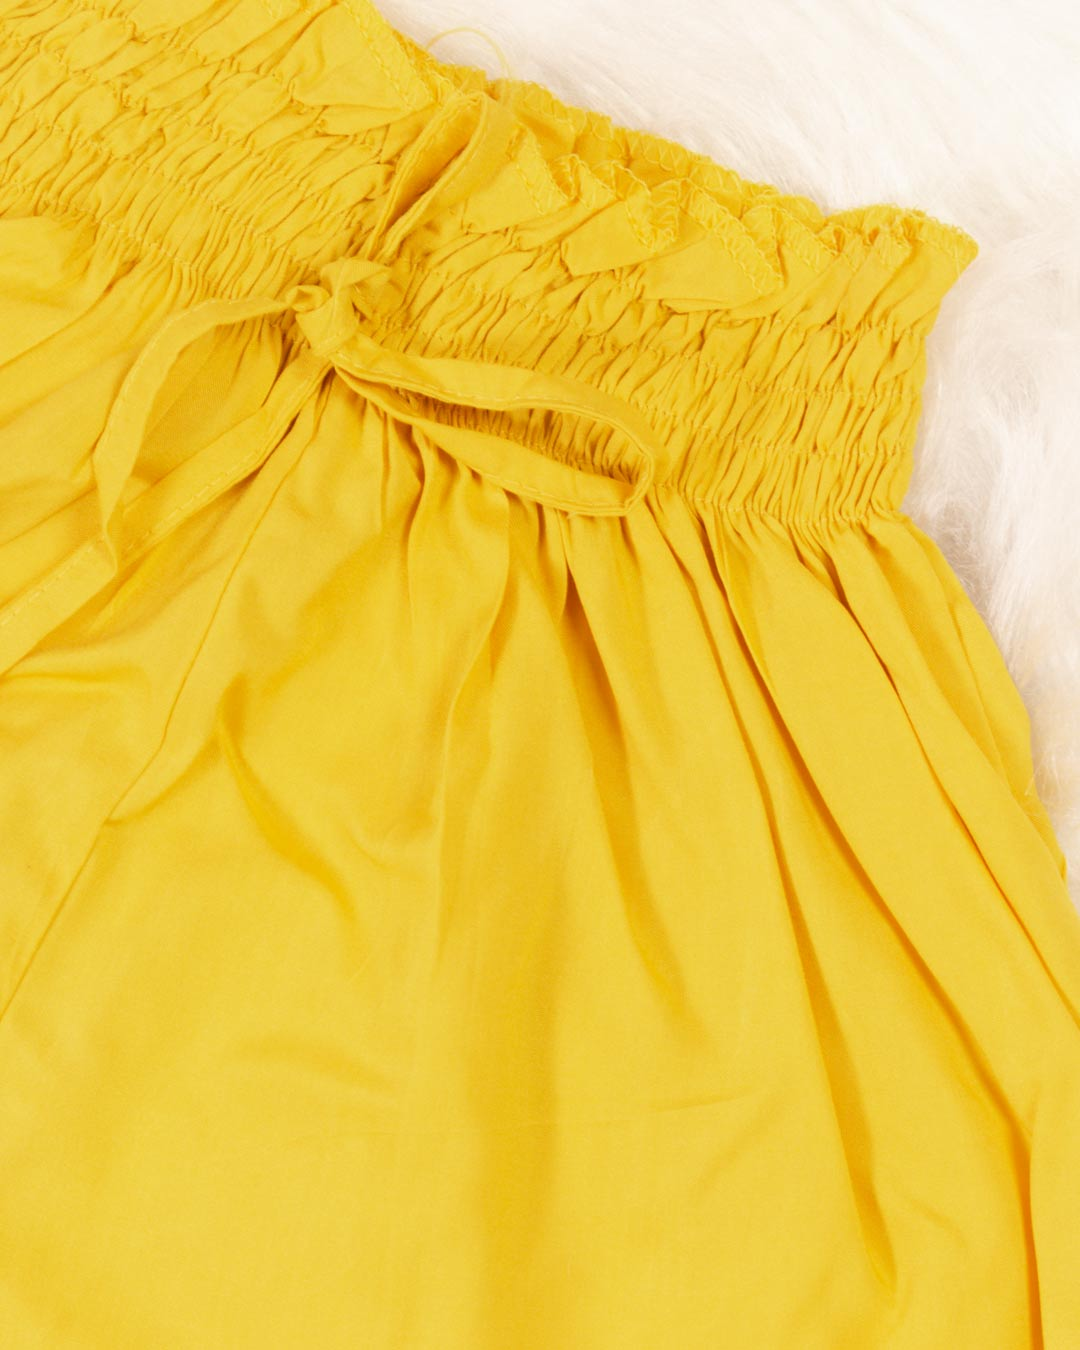 Shorts Adulto Godê Amarelo - Moça Bonita